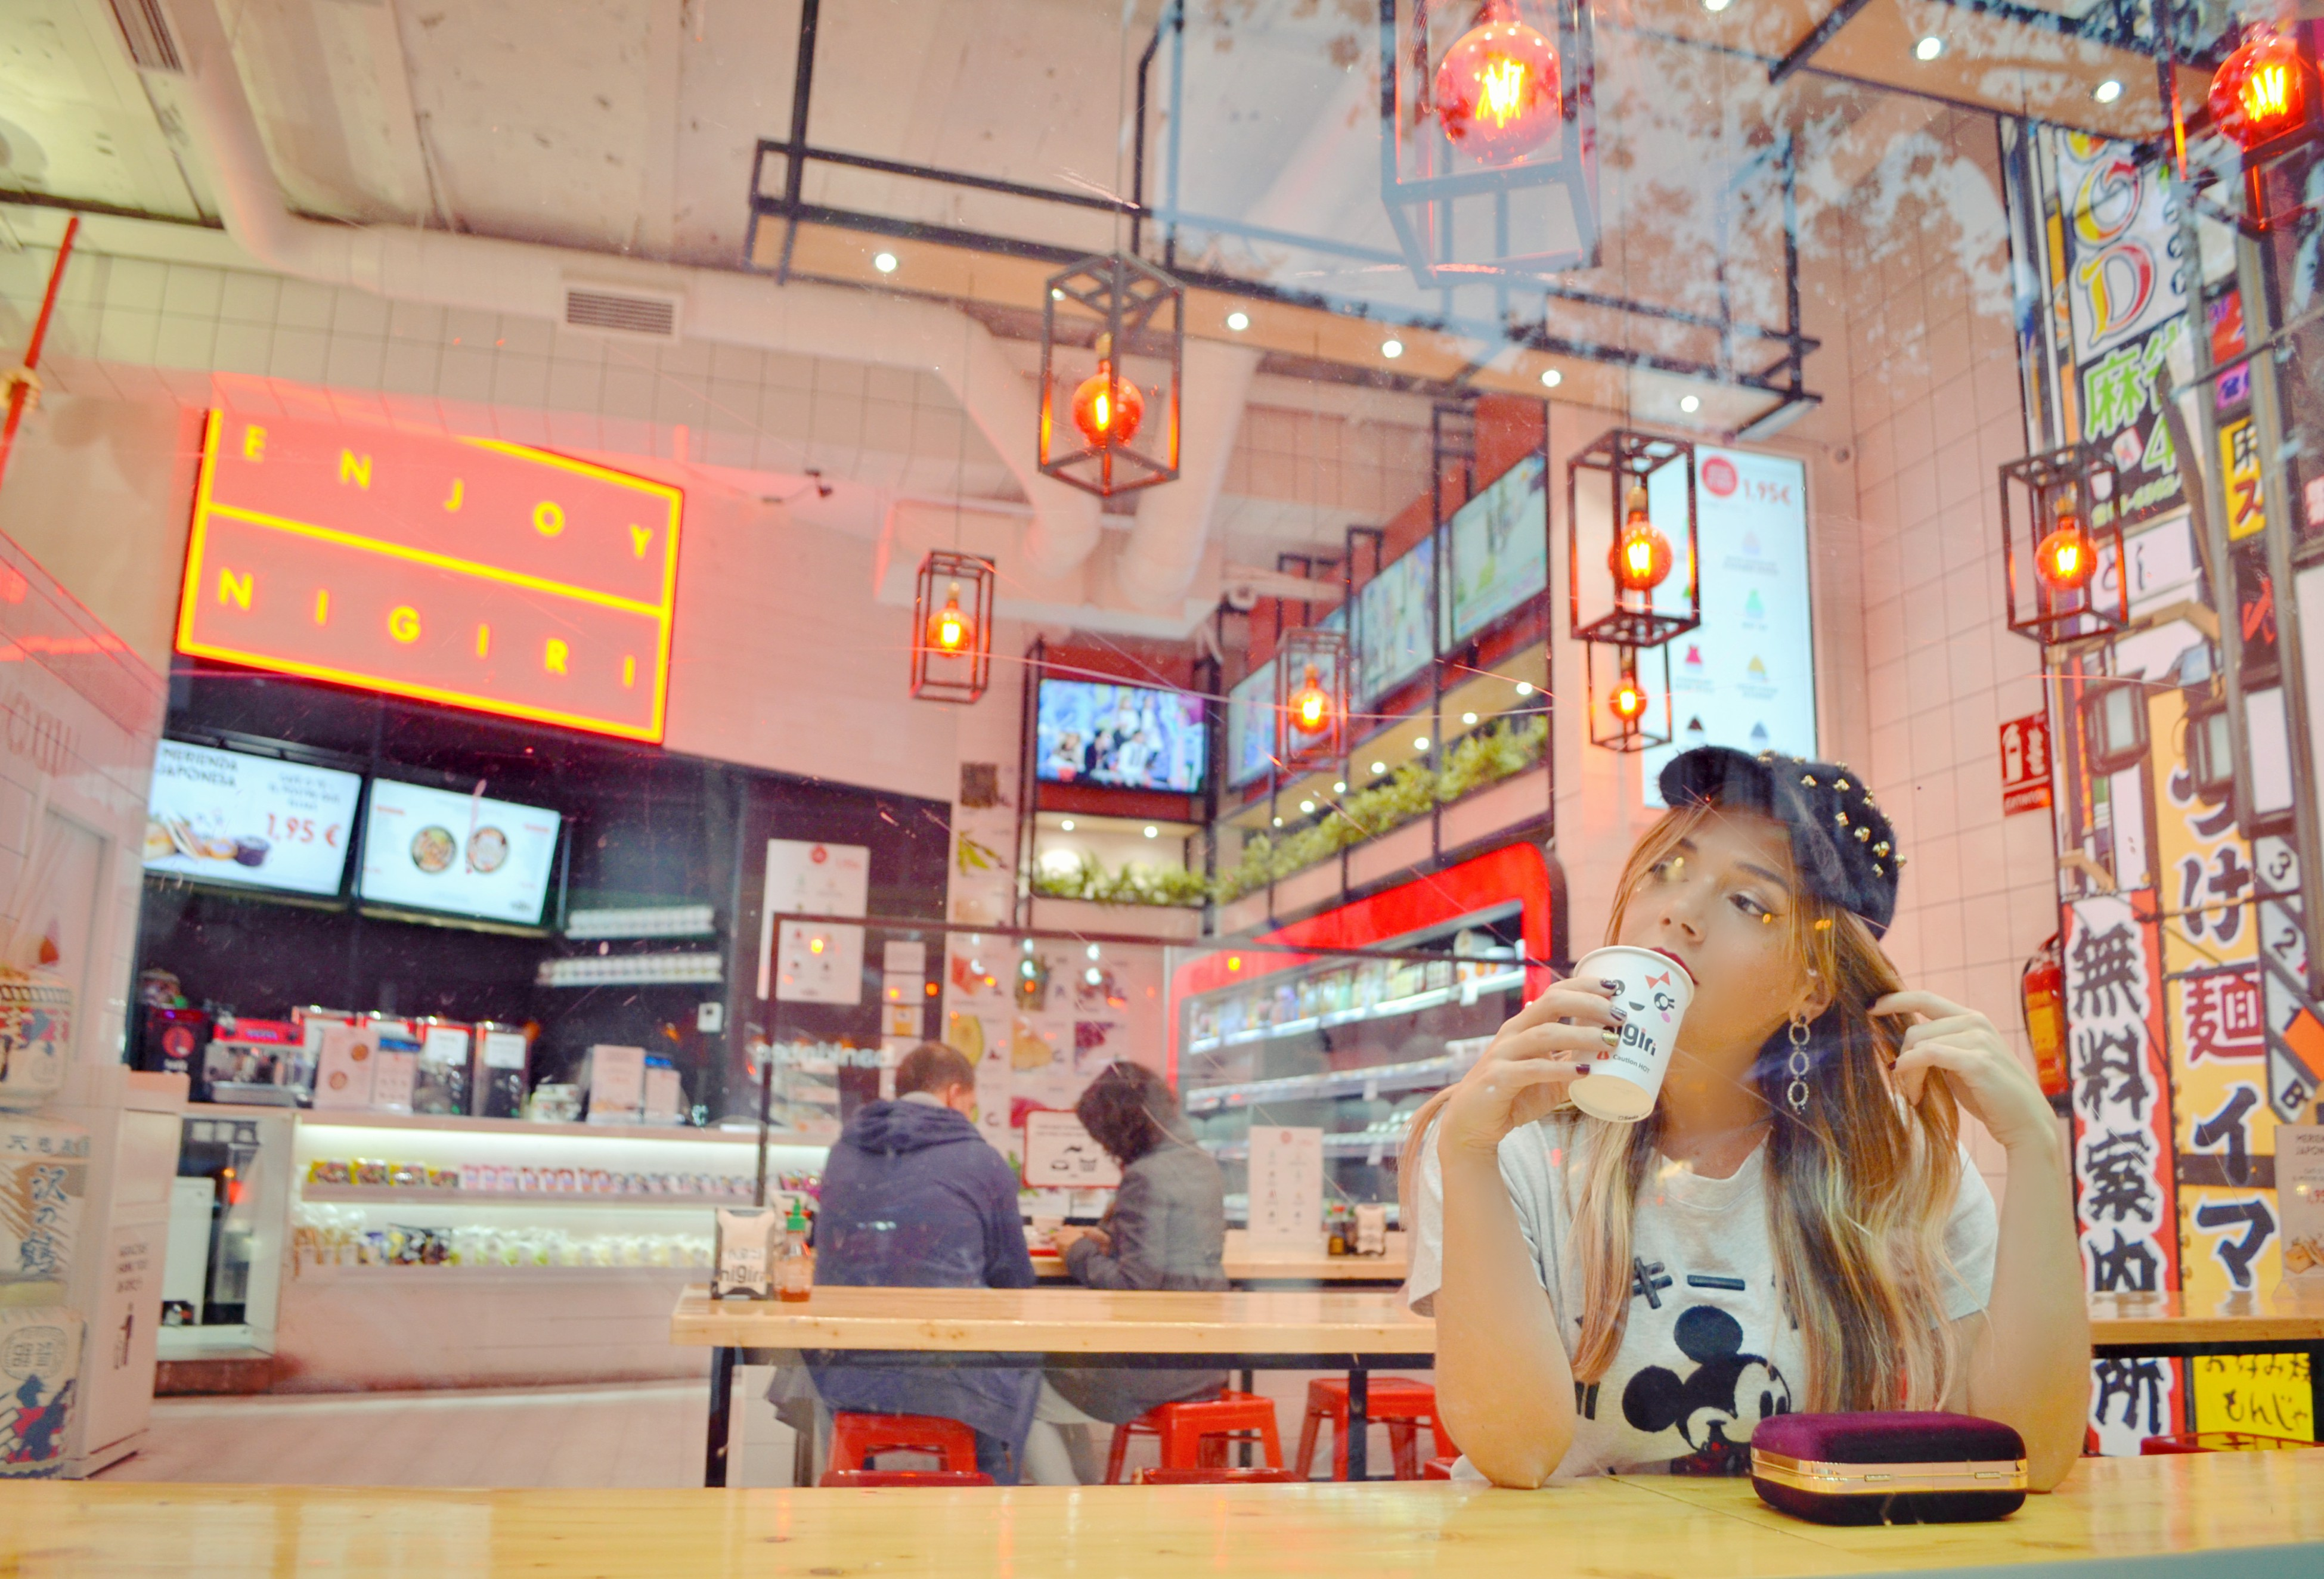 Nigiri-Madrid-gastro-blogger-sushi-ChicAdicta-blog-de-moda-influencer-Chic-Adicta-camiseta-de-mickey-mango-PiensaenChic-Piensa-en-Chic